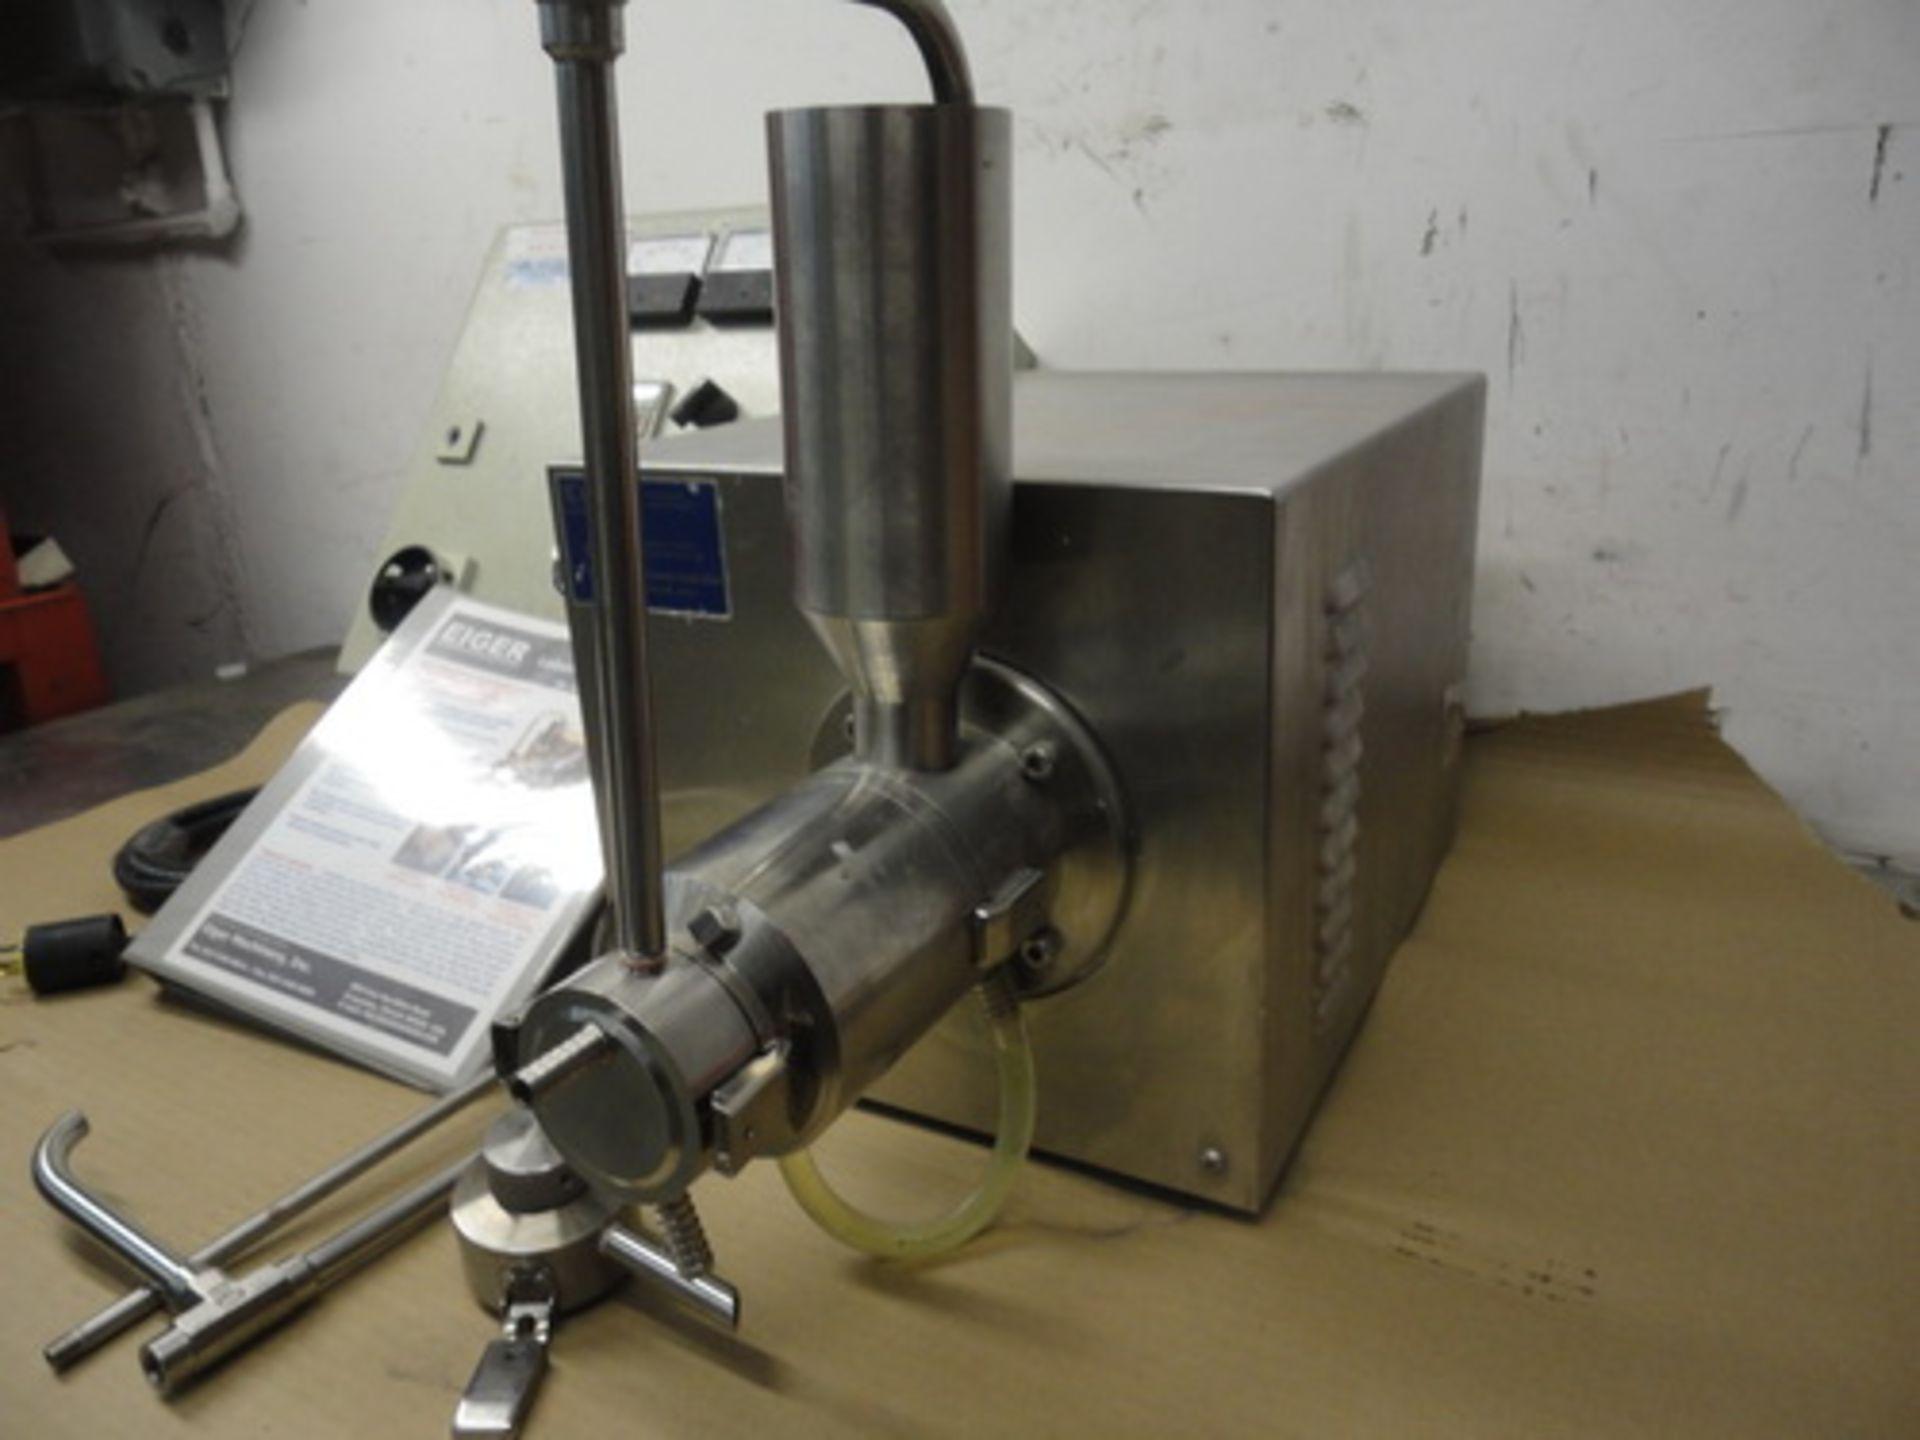 Lot 108 - Eiger SS horizontal lab/pilot media mill, Model 250-VSE-EXP, S/N 10135